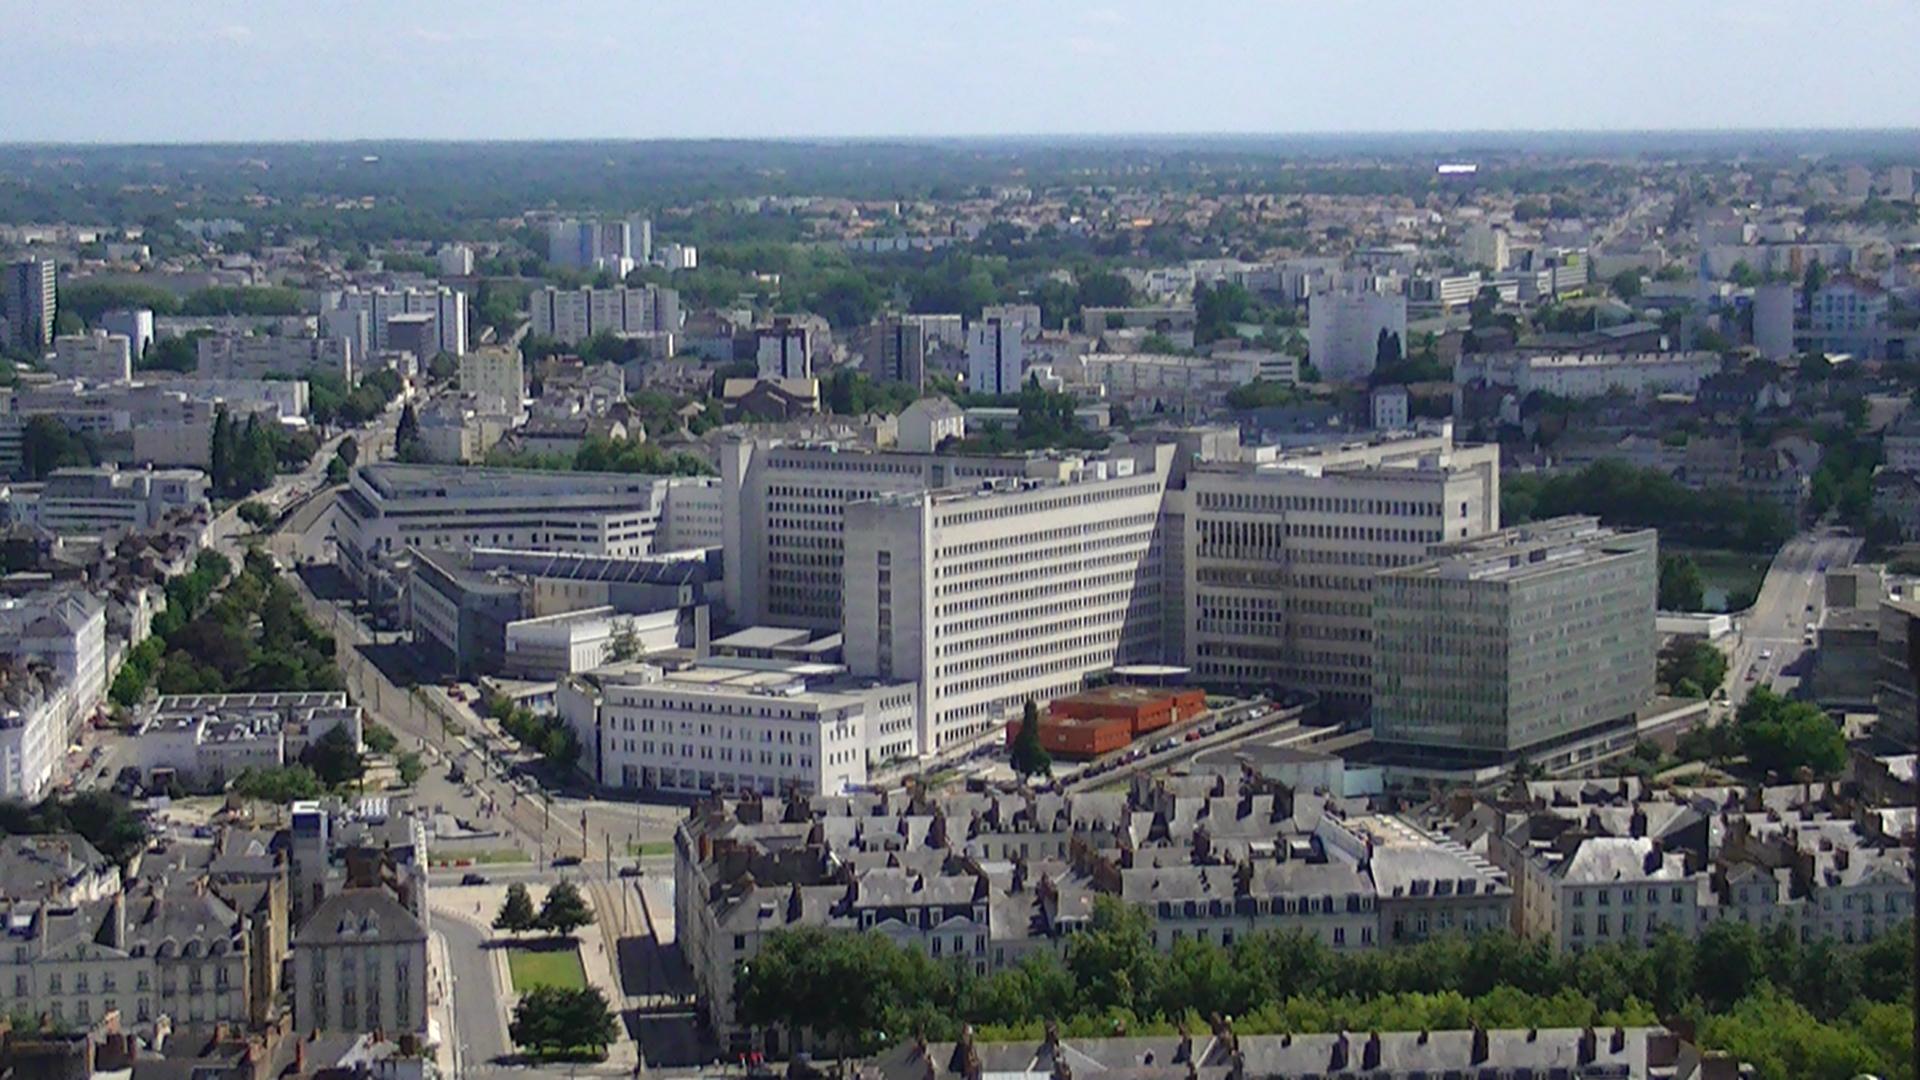 Hotel Dieu Nantes Parking